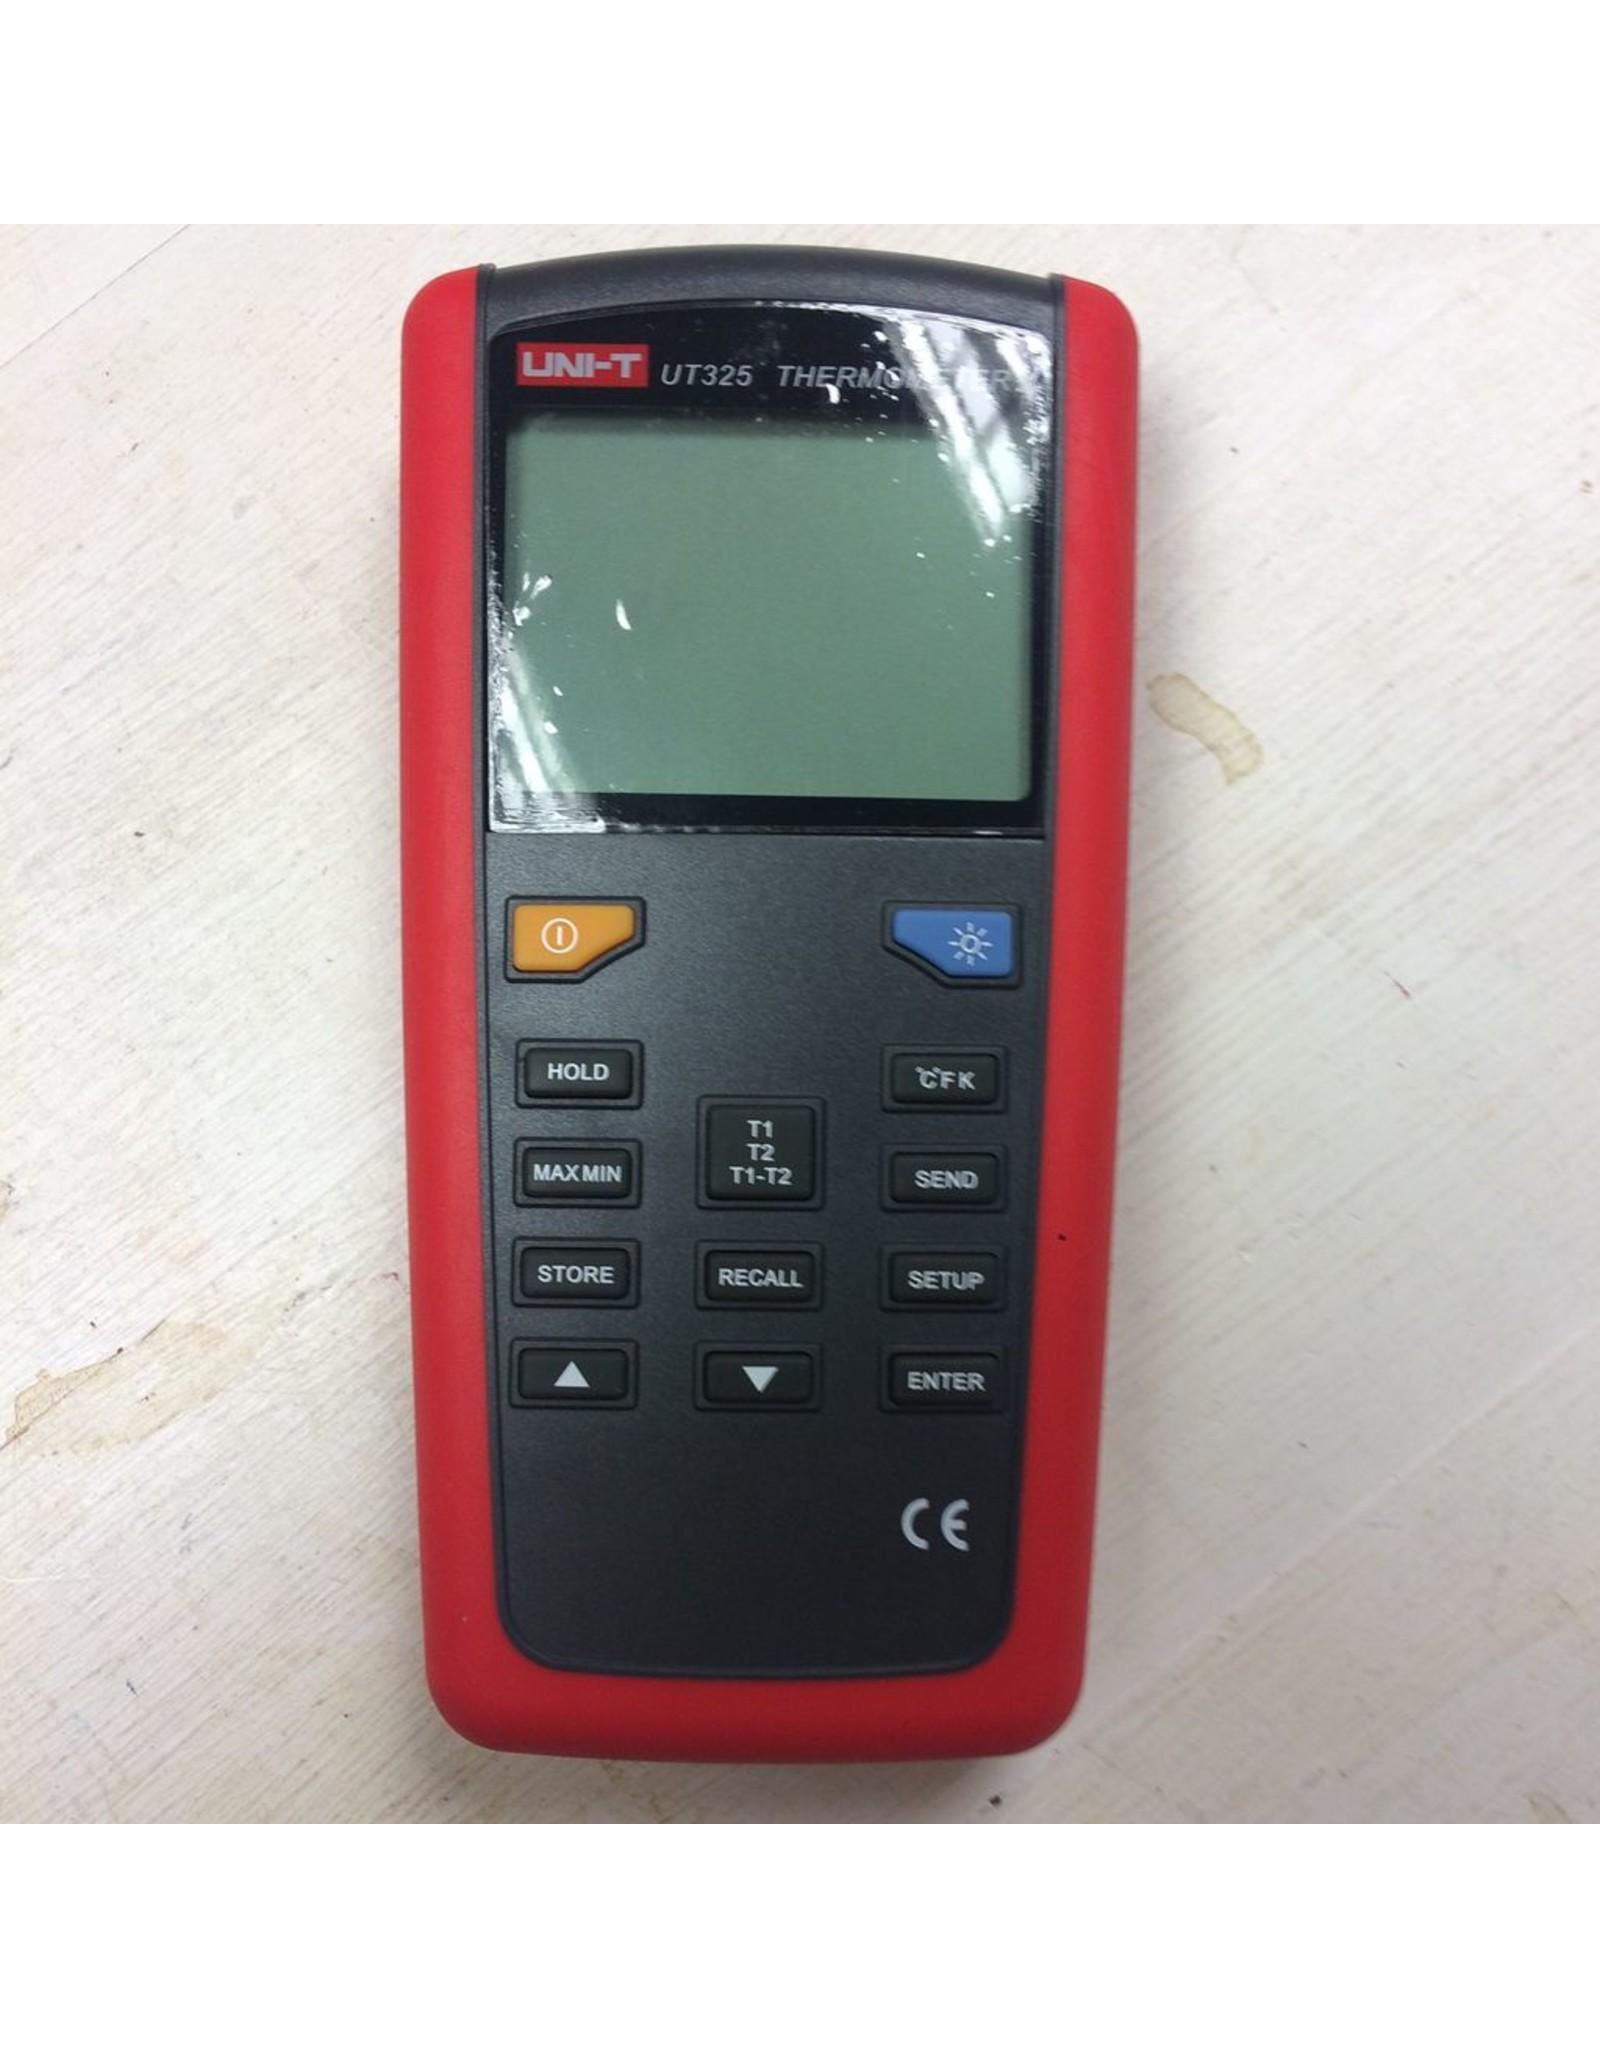 UT325 Didital Pyrometer/thermometer